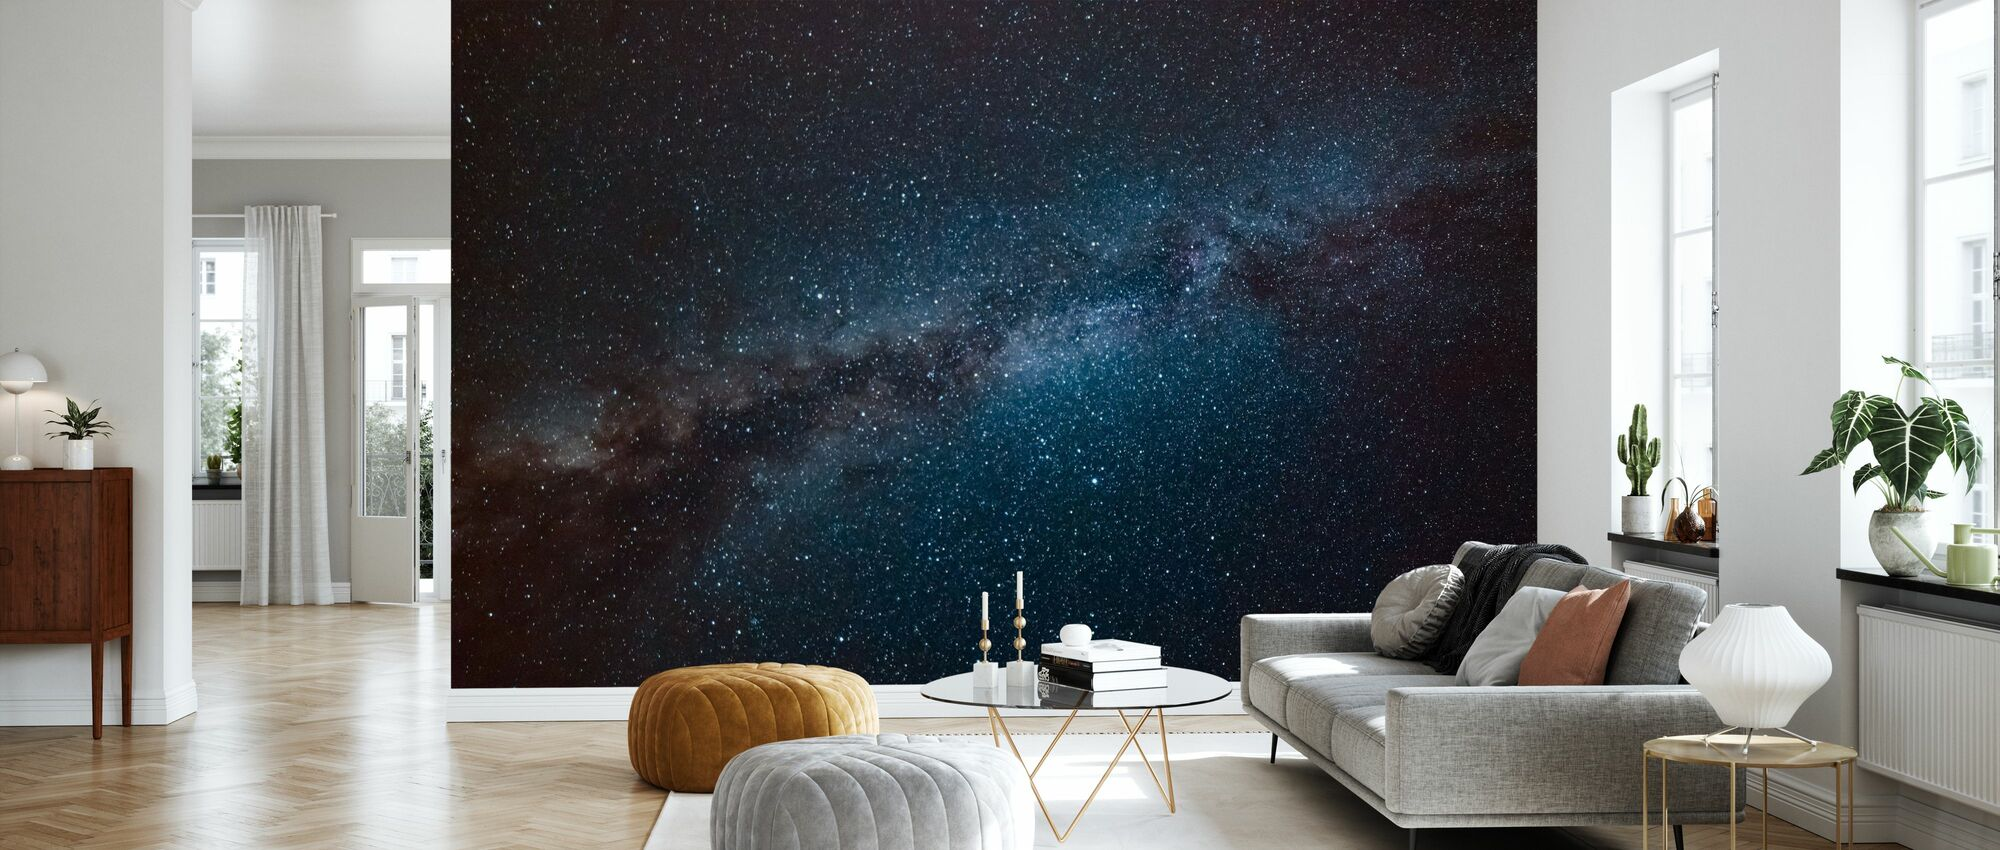 Astronomy Constellation - Wallpaper - Living Room